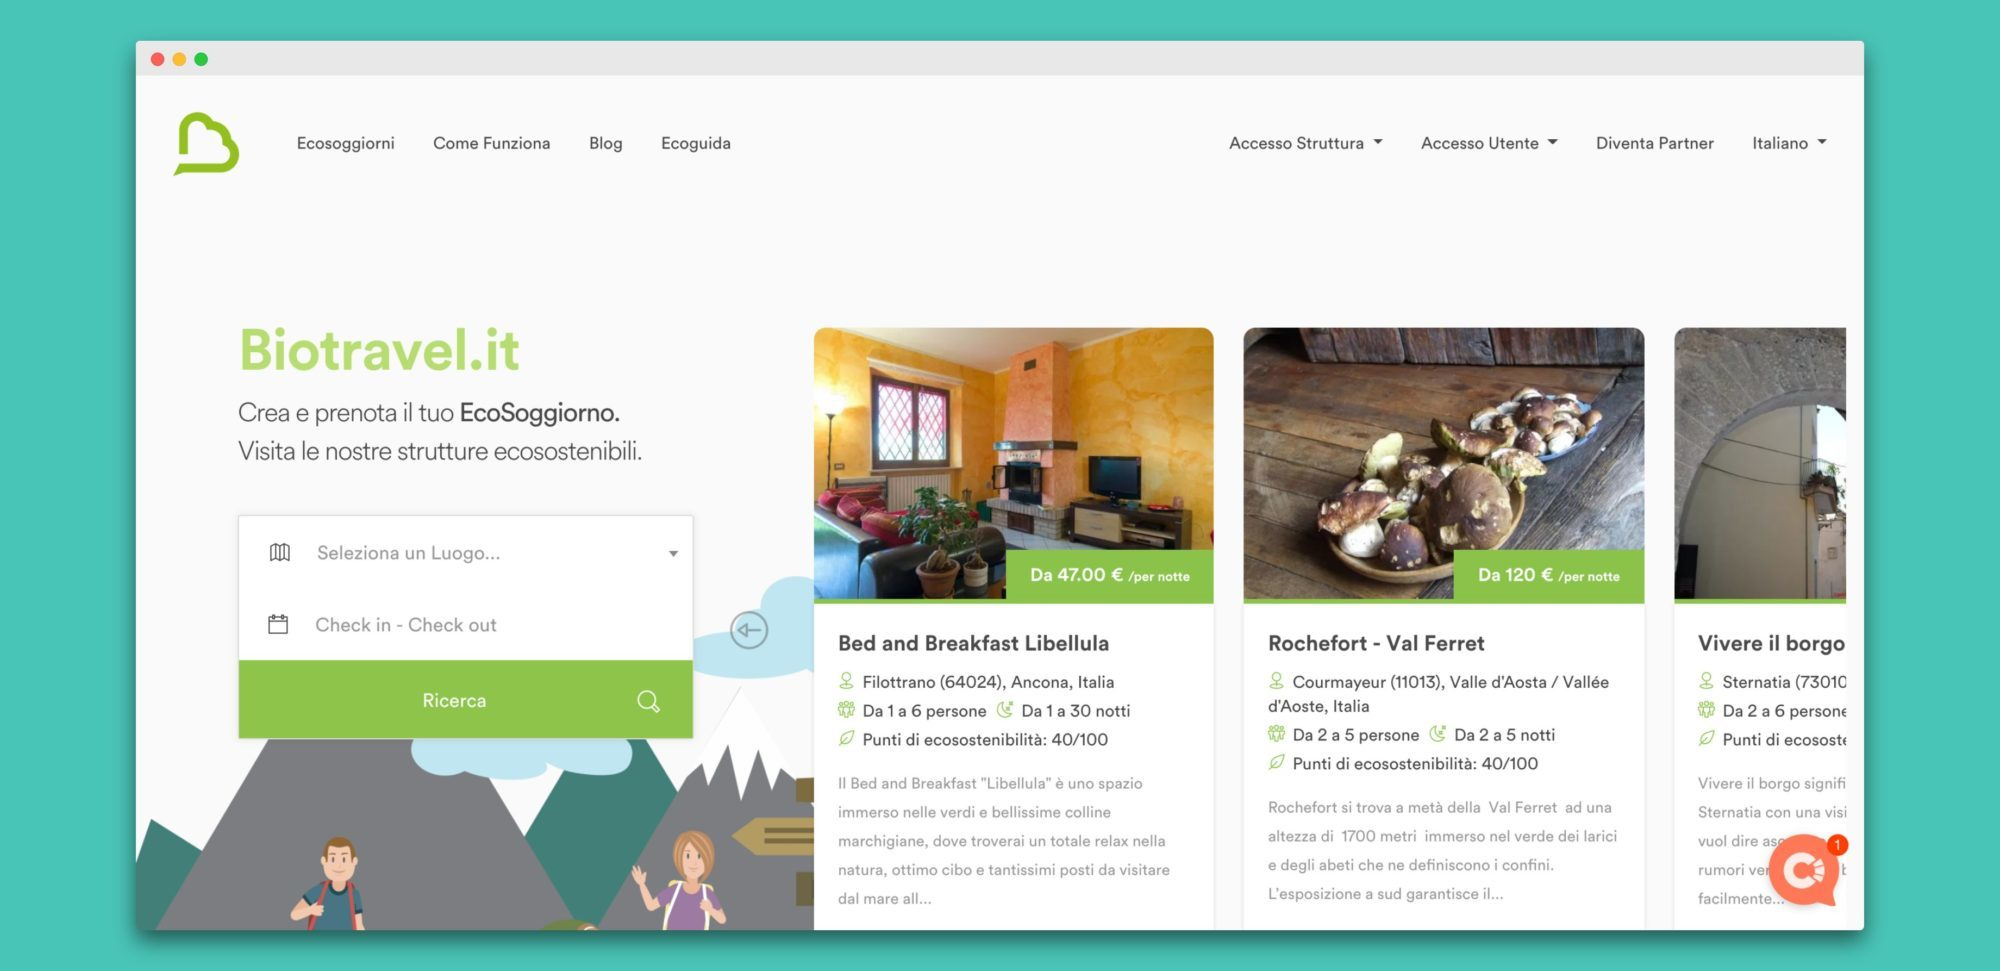 biotravel teroro agency piattaforma webapp 1 - Biotravel